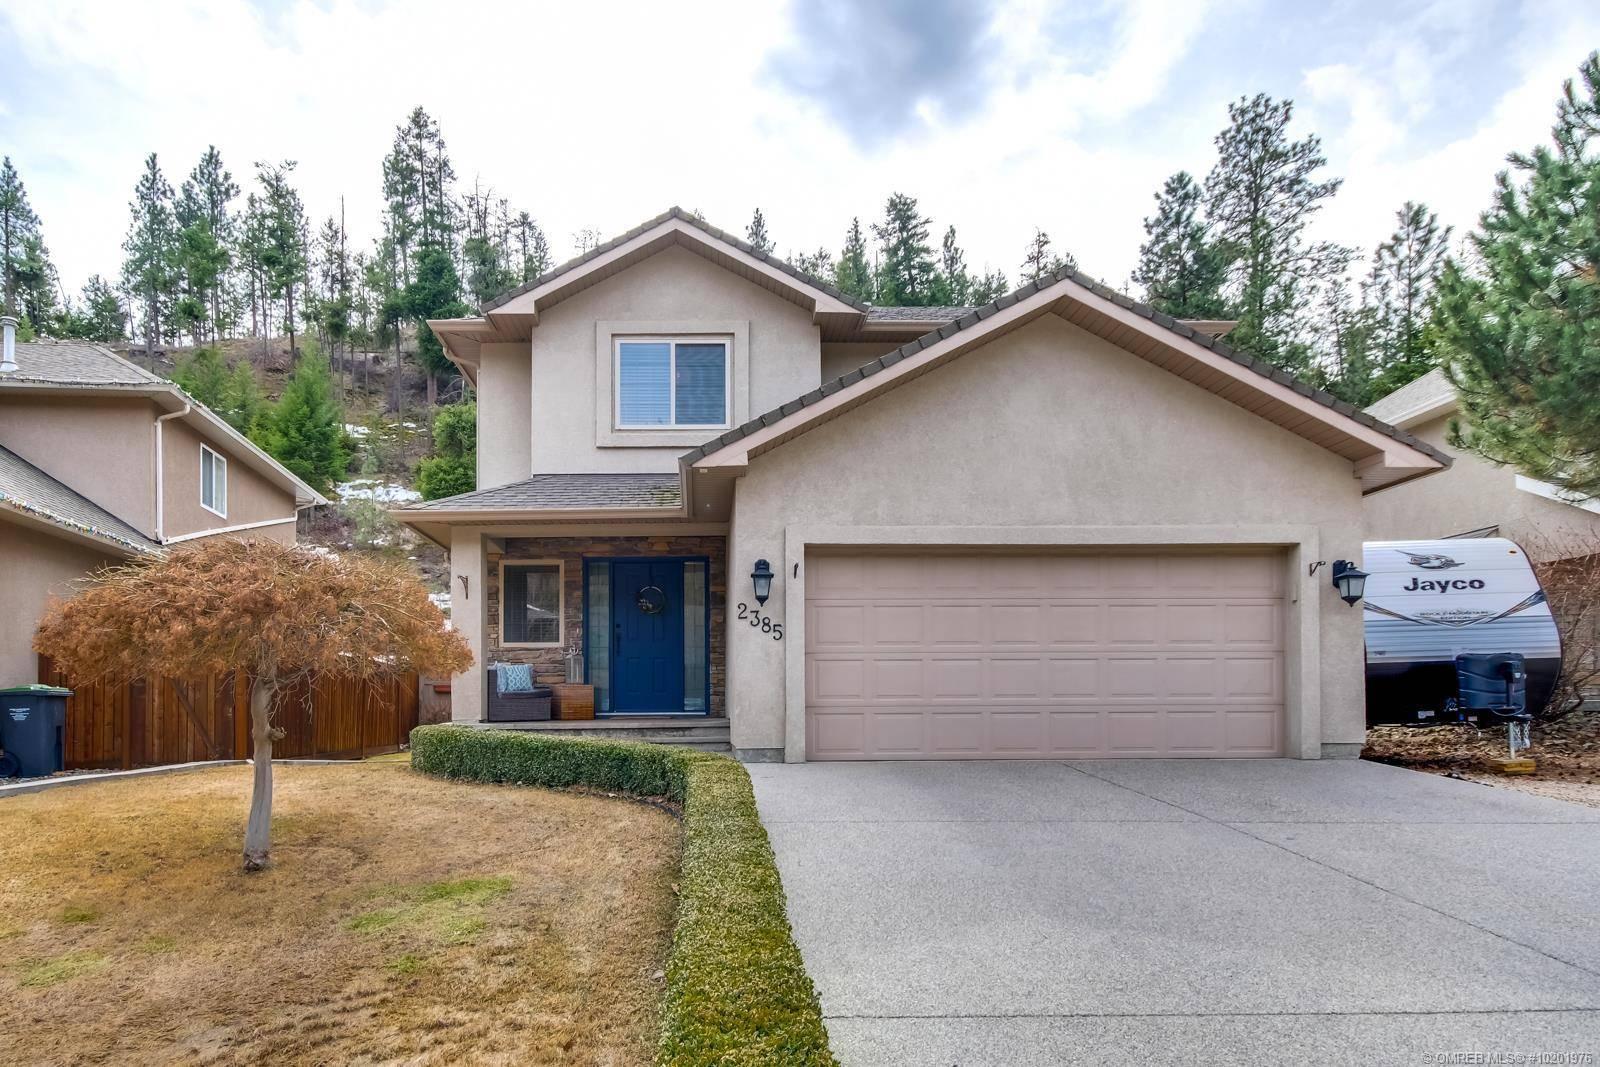 House for sale at 2385 Selkirk Dr Kelowna British Columbia - MLS: 10201976